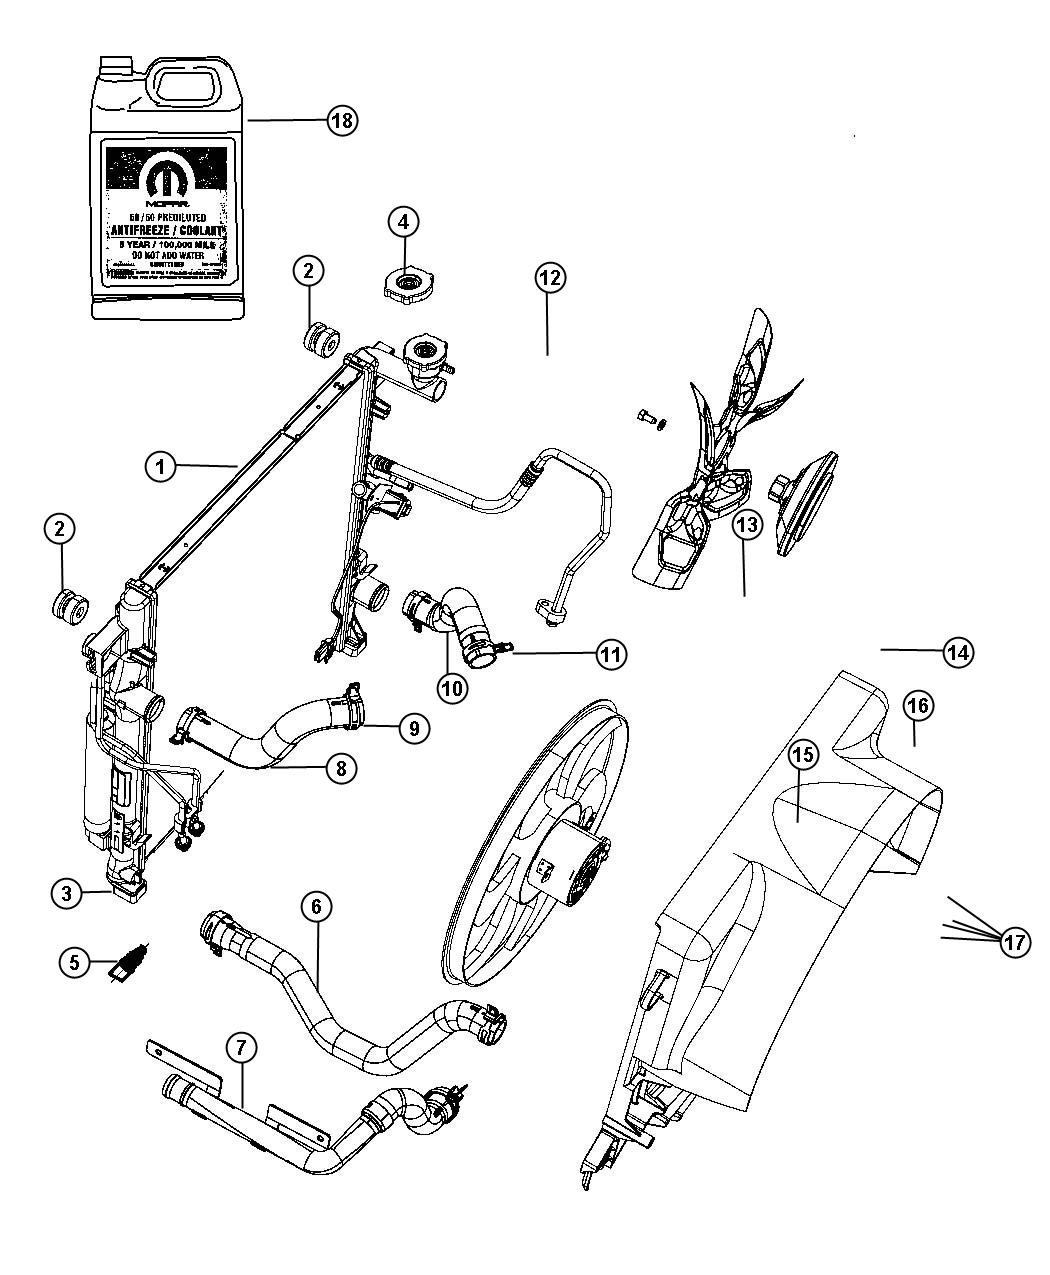 Dayton Electric Motor Wiring Diagram 6 Lead